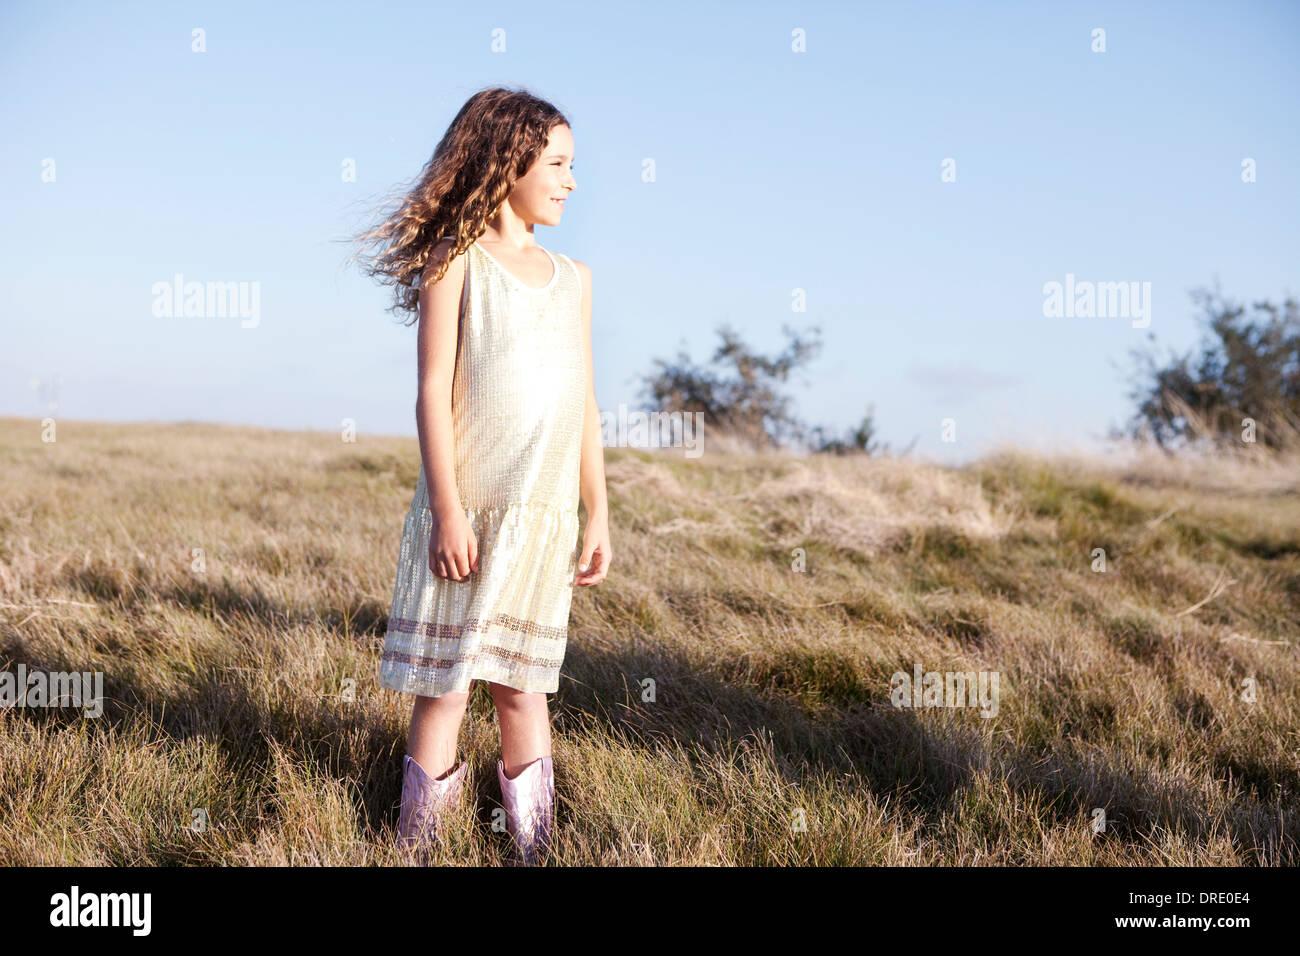 Joven en la vestimenta en Hillside Imagen De Stock